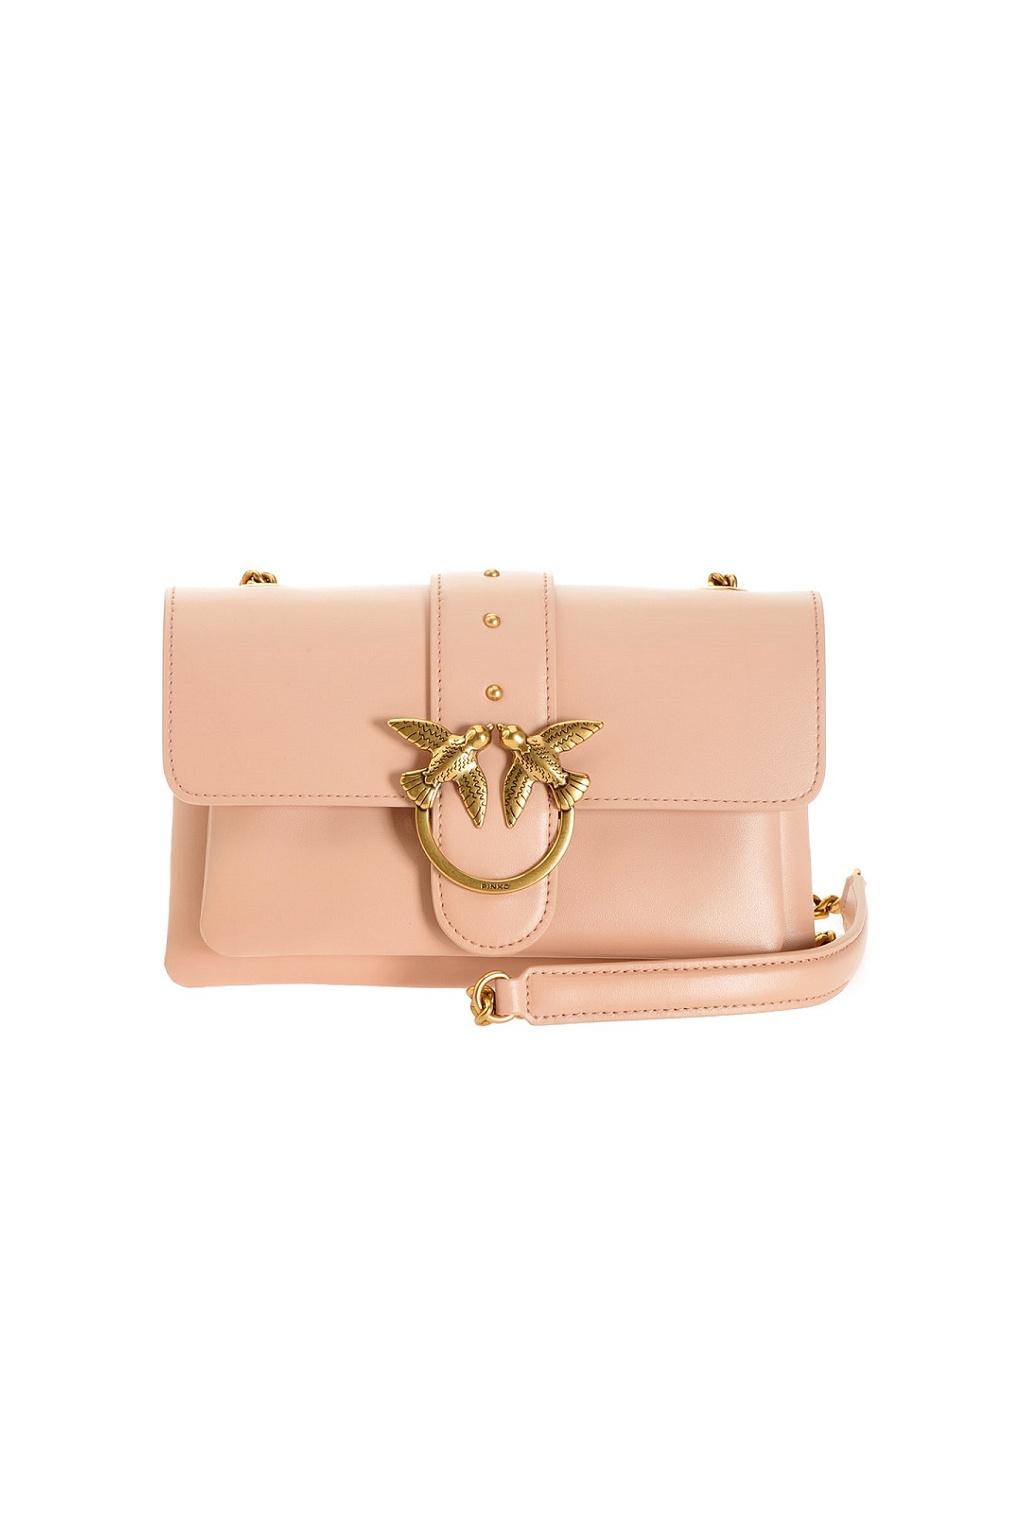 1P21SKY6JC Q19 Dámská kabelka Pinko Love Mini Soft Simply Cl růžová